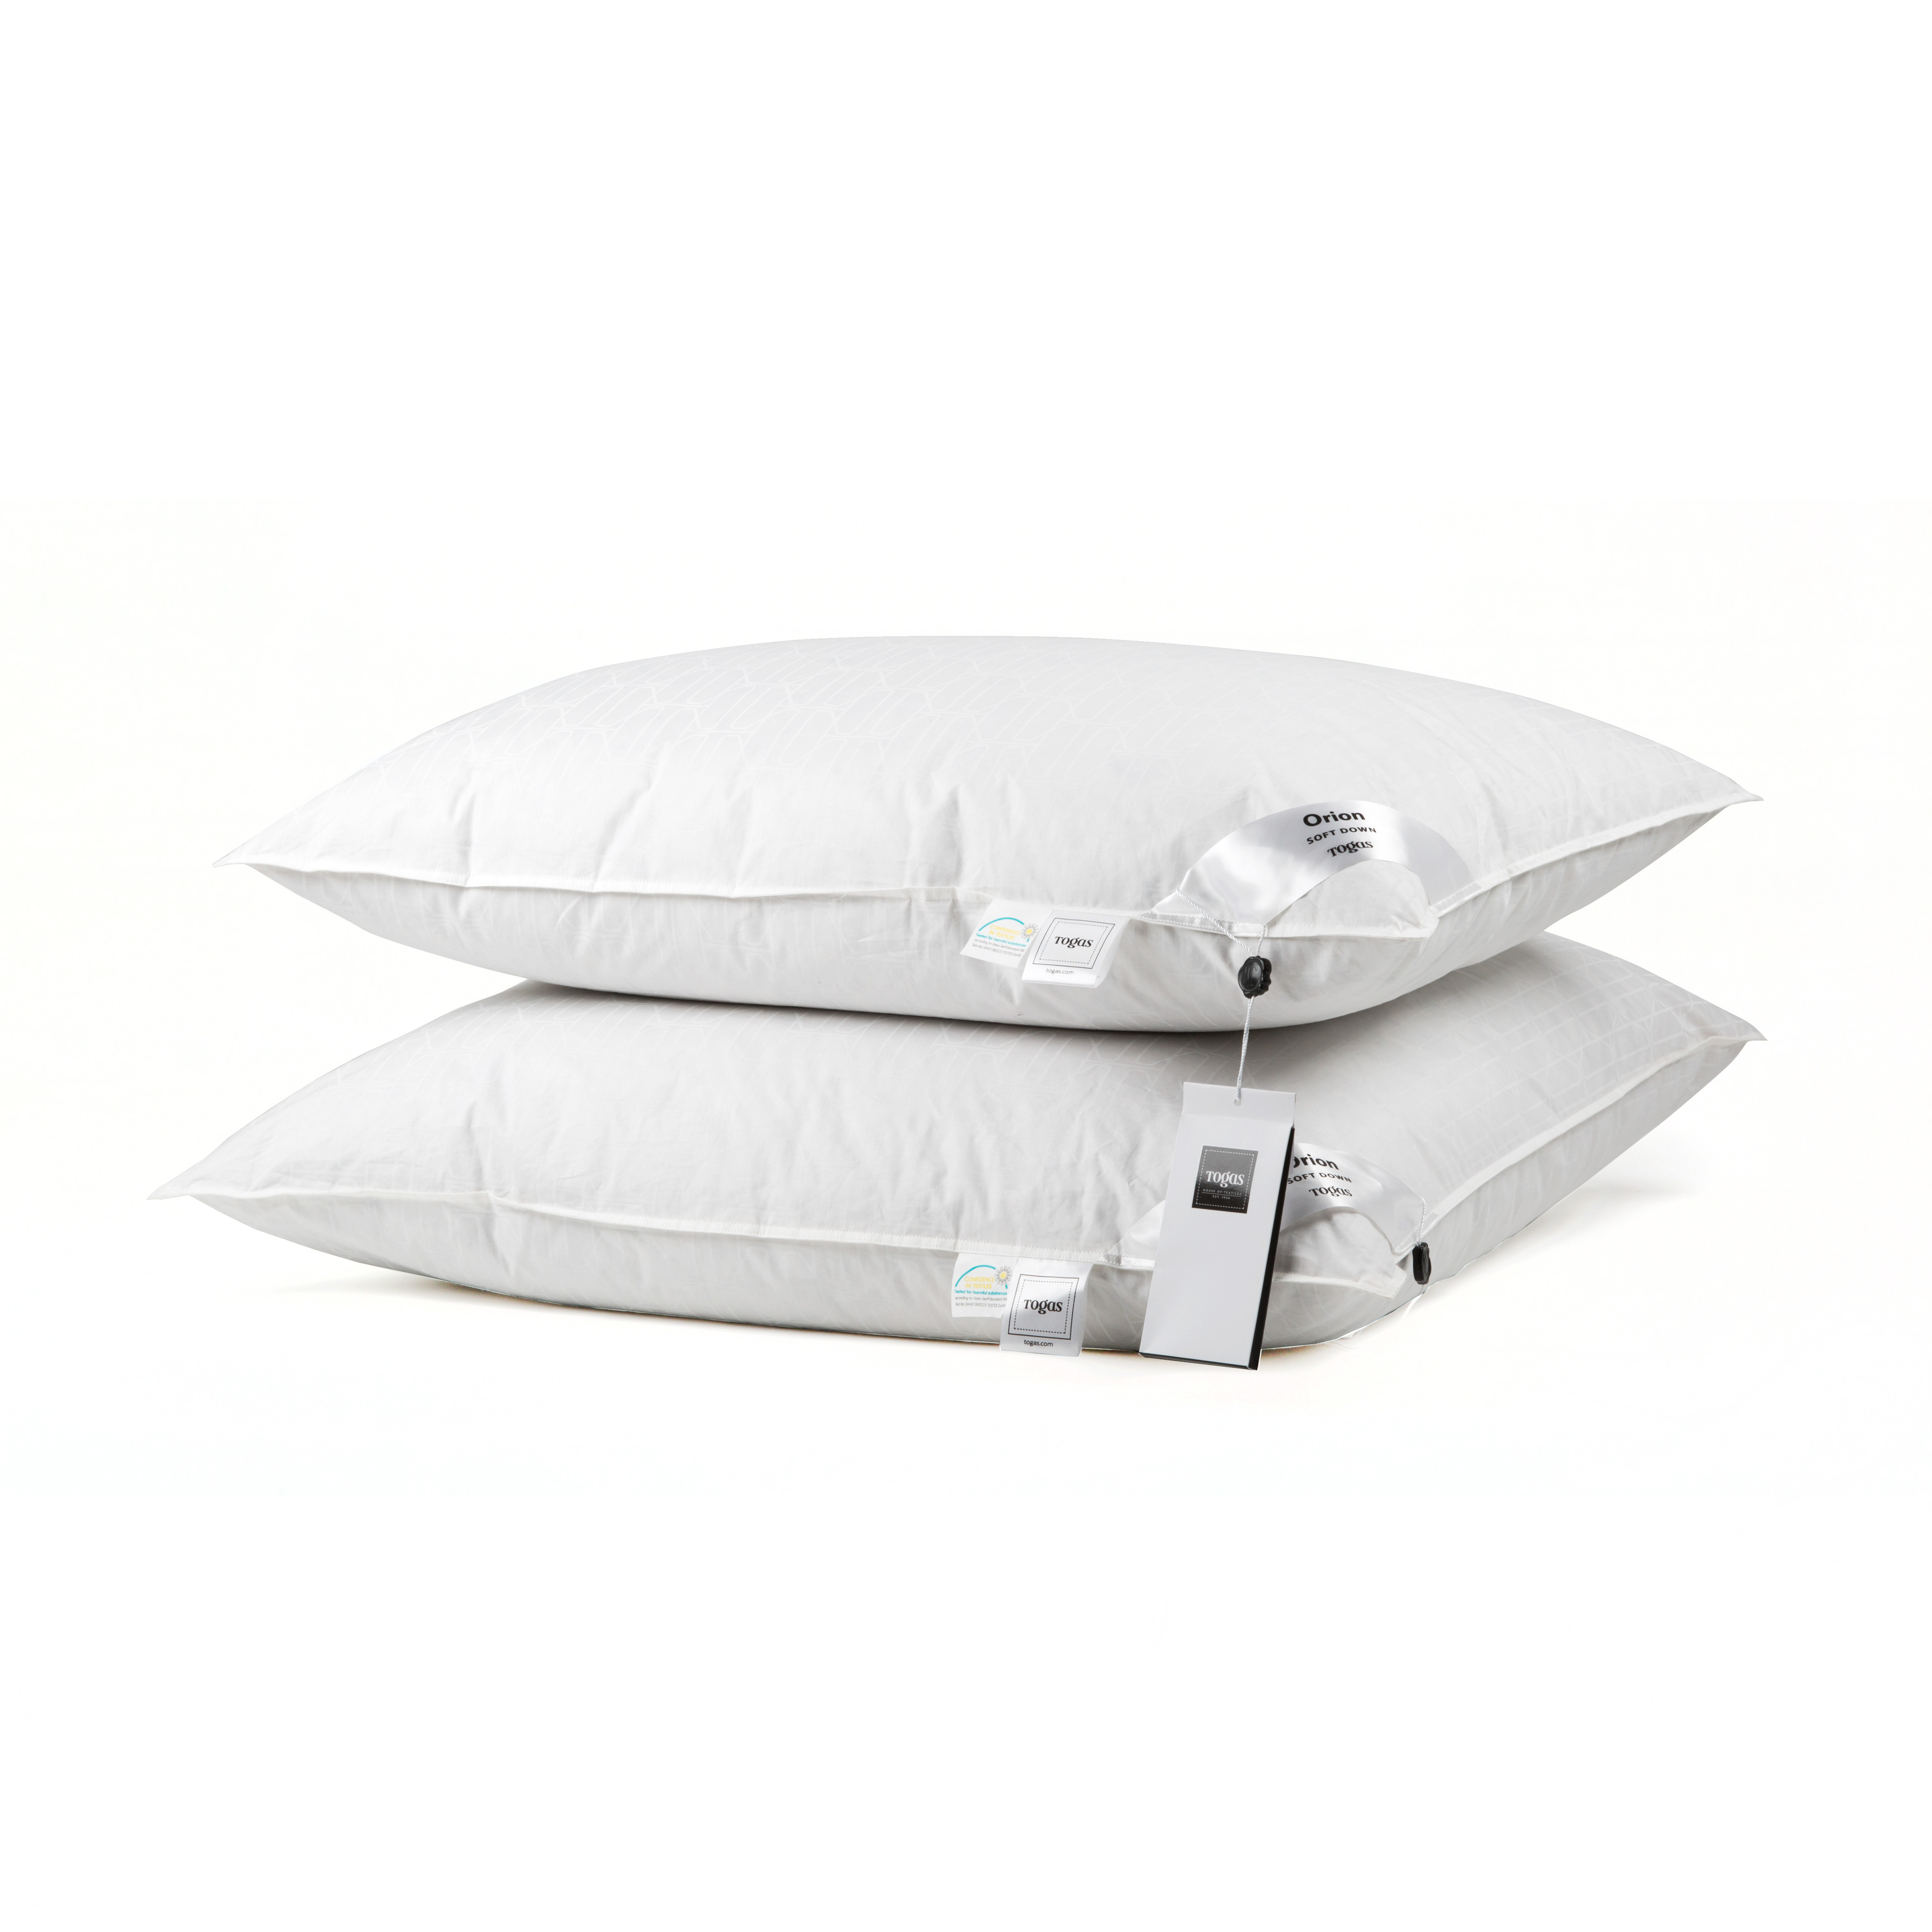 Подушки Togas Подушка Орион (70х70) подушки ортопедические togas подушка ортопедическая германиум